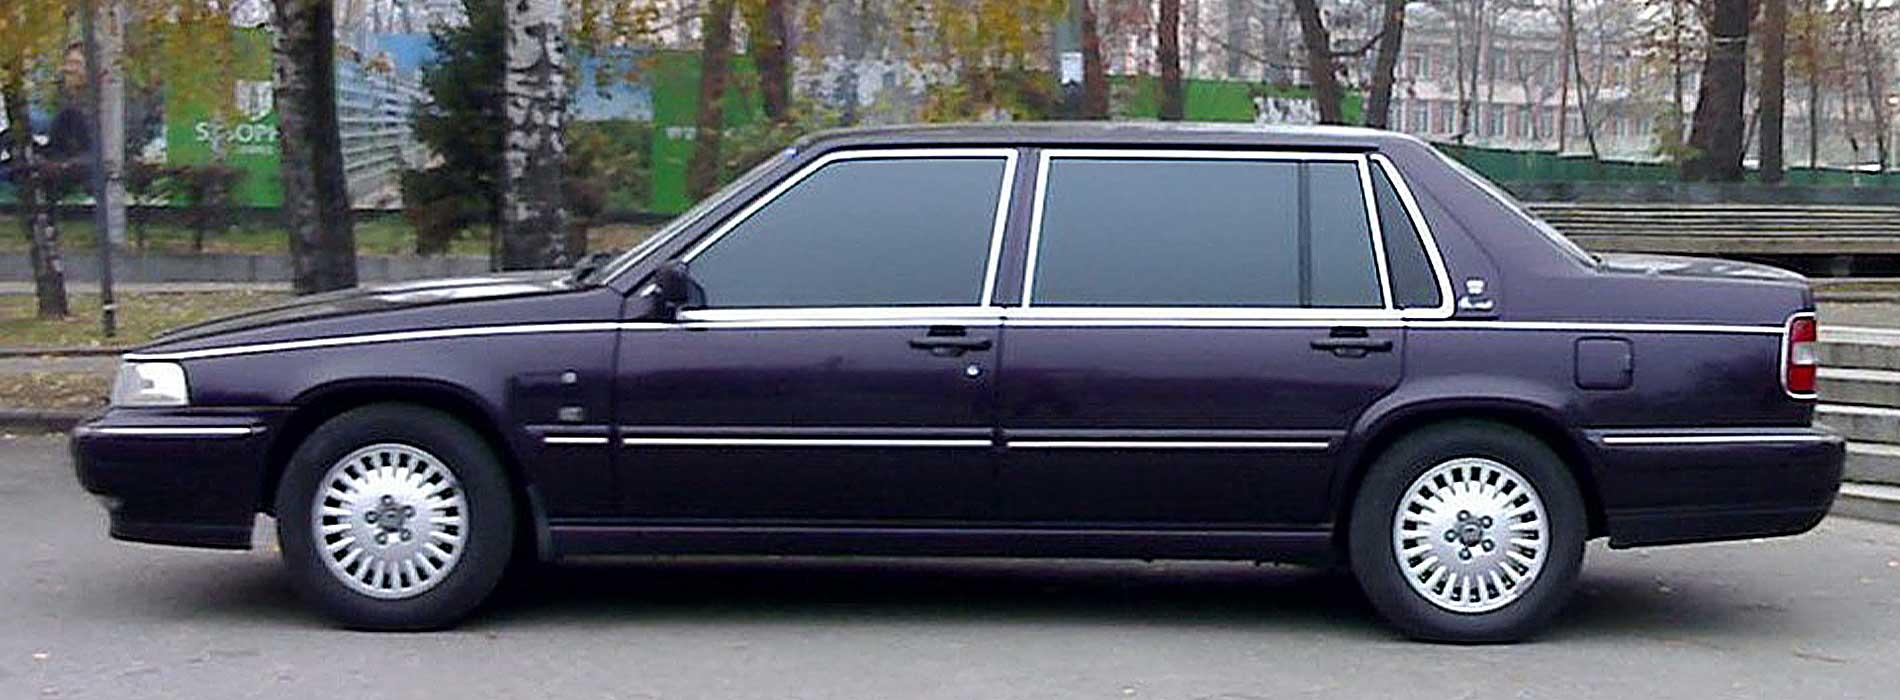 Volvo S90 Royal